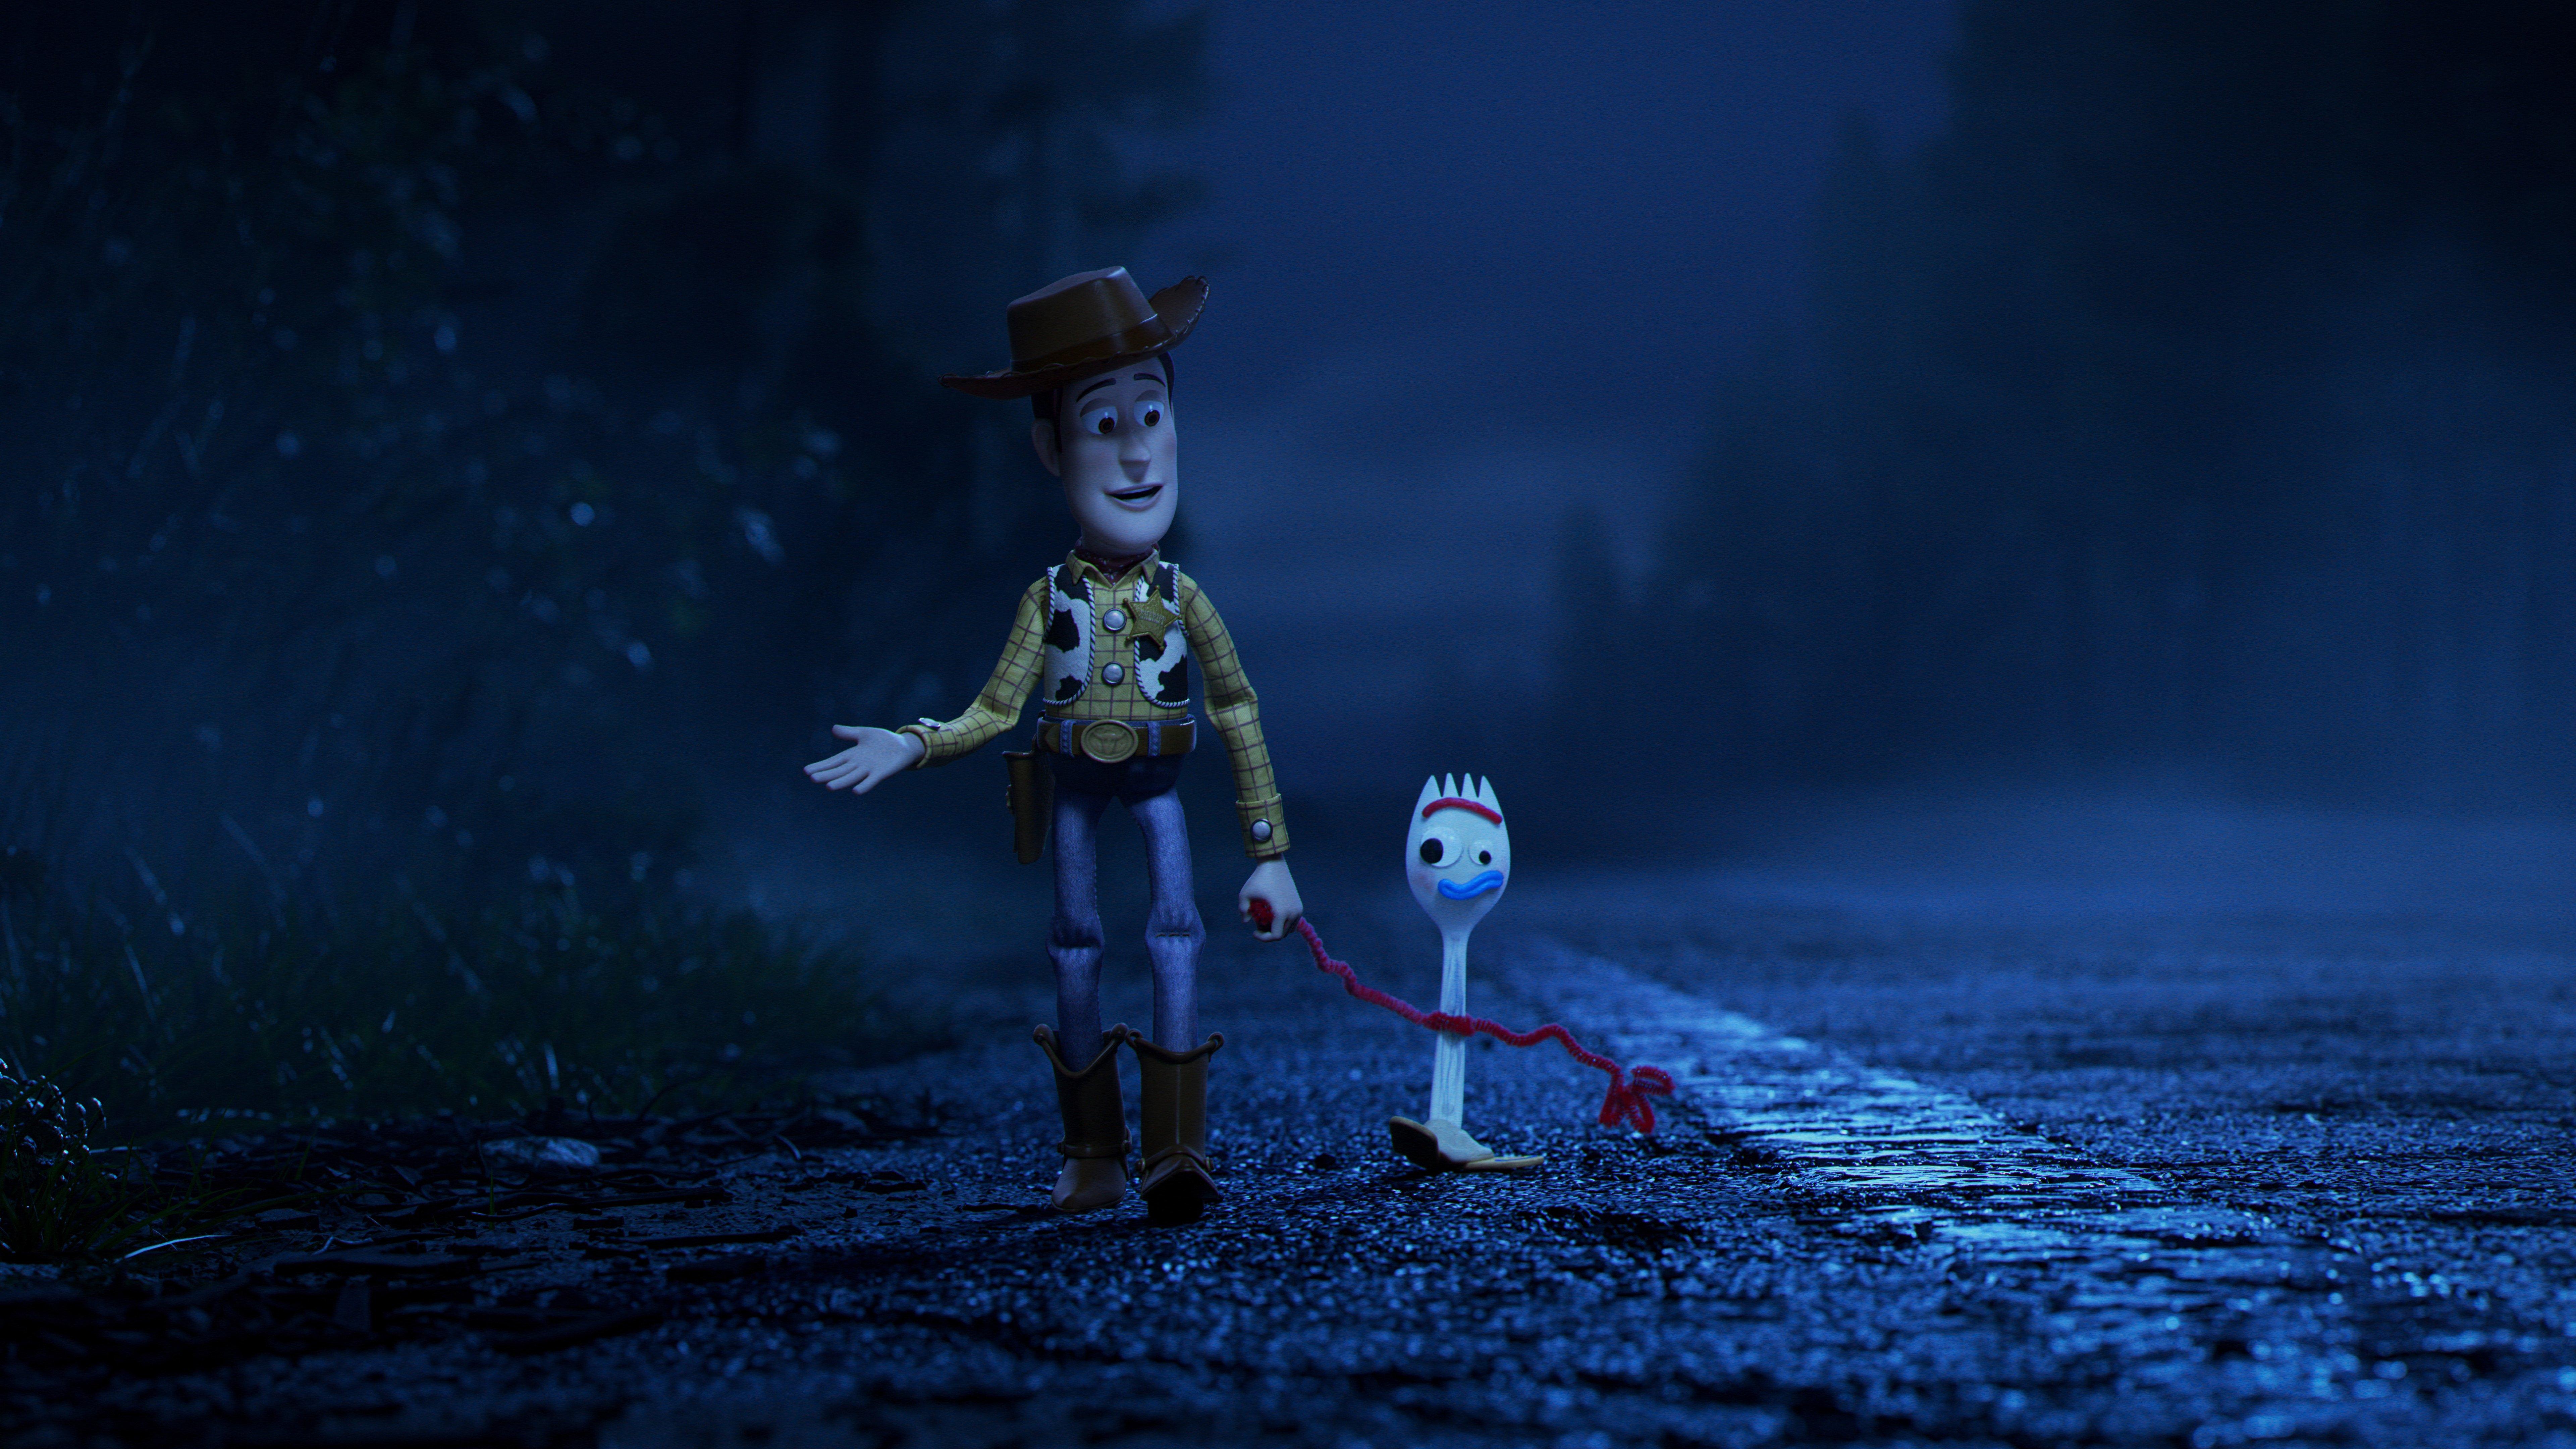 Fondos de pantalla Toy Story 4 Woody y Forky